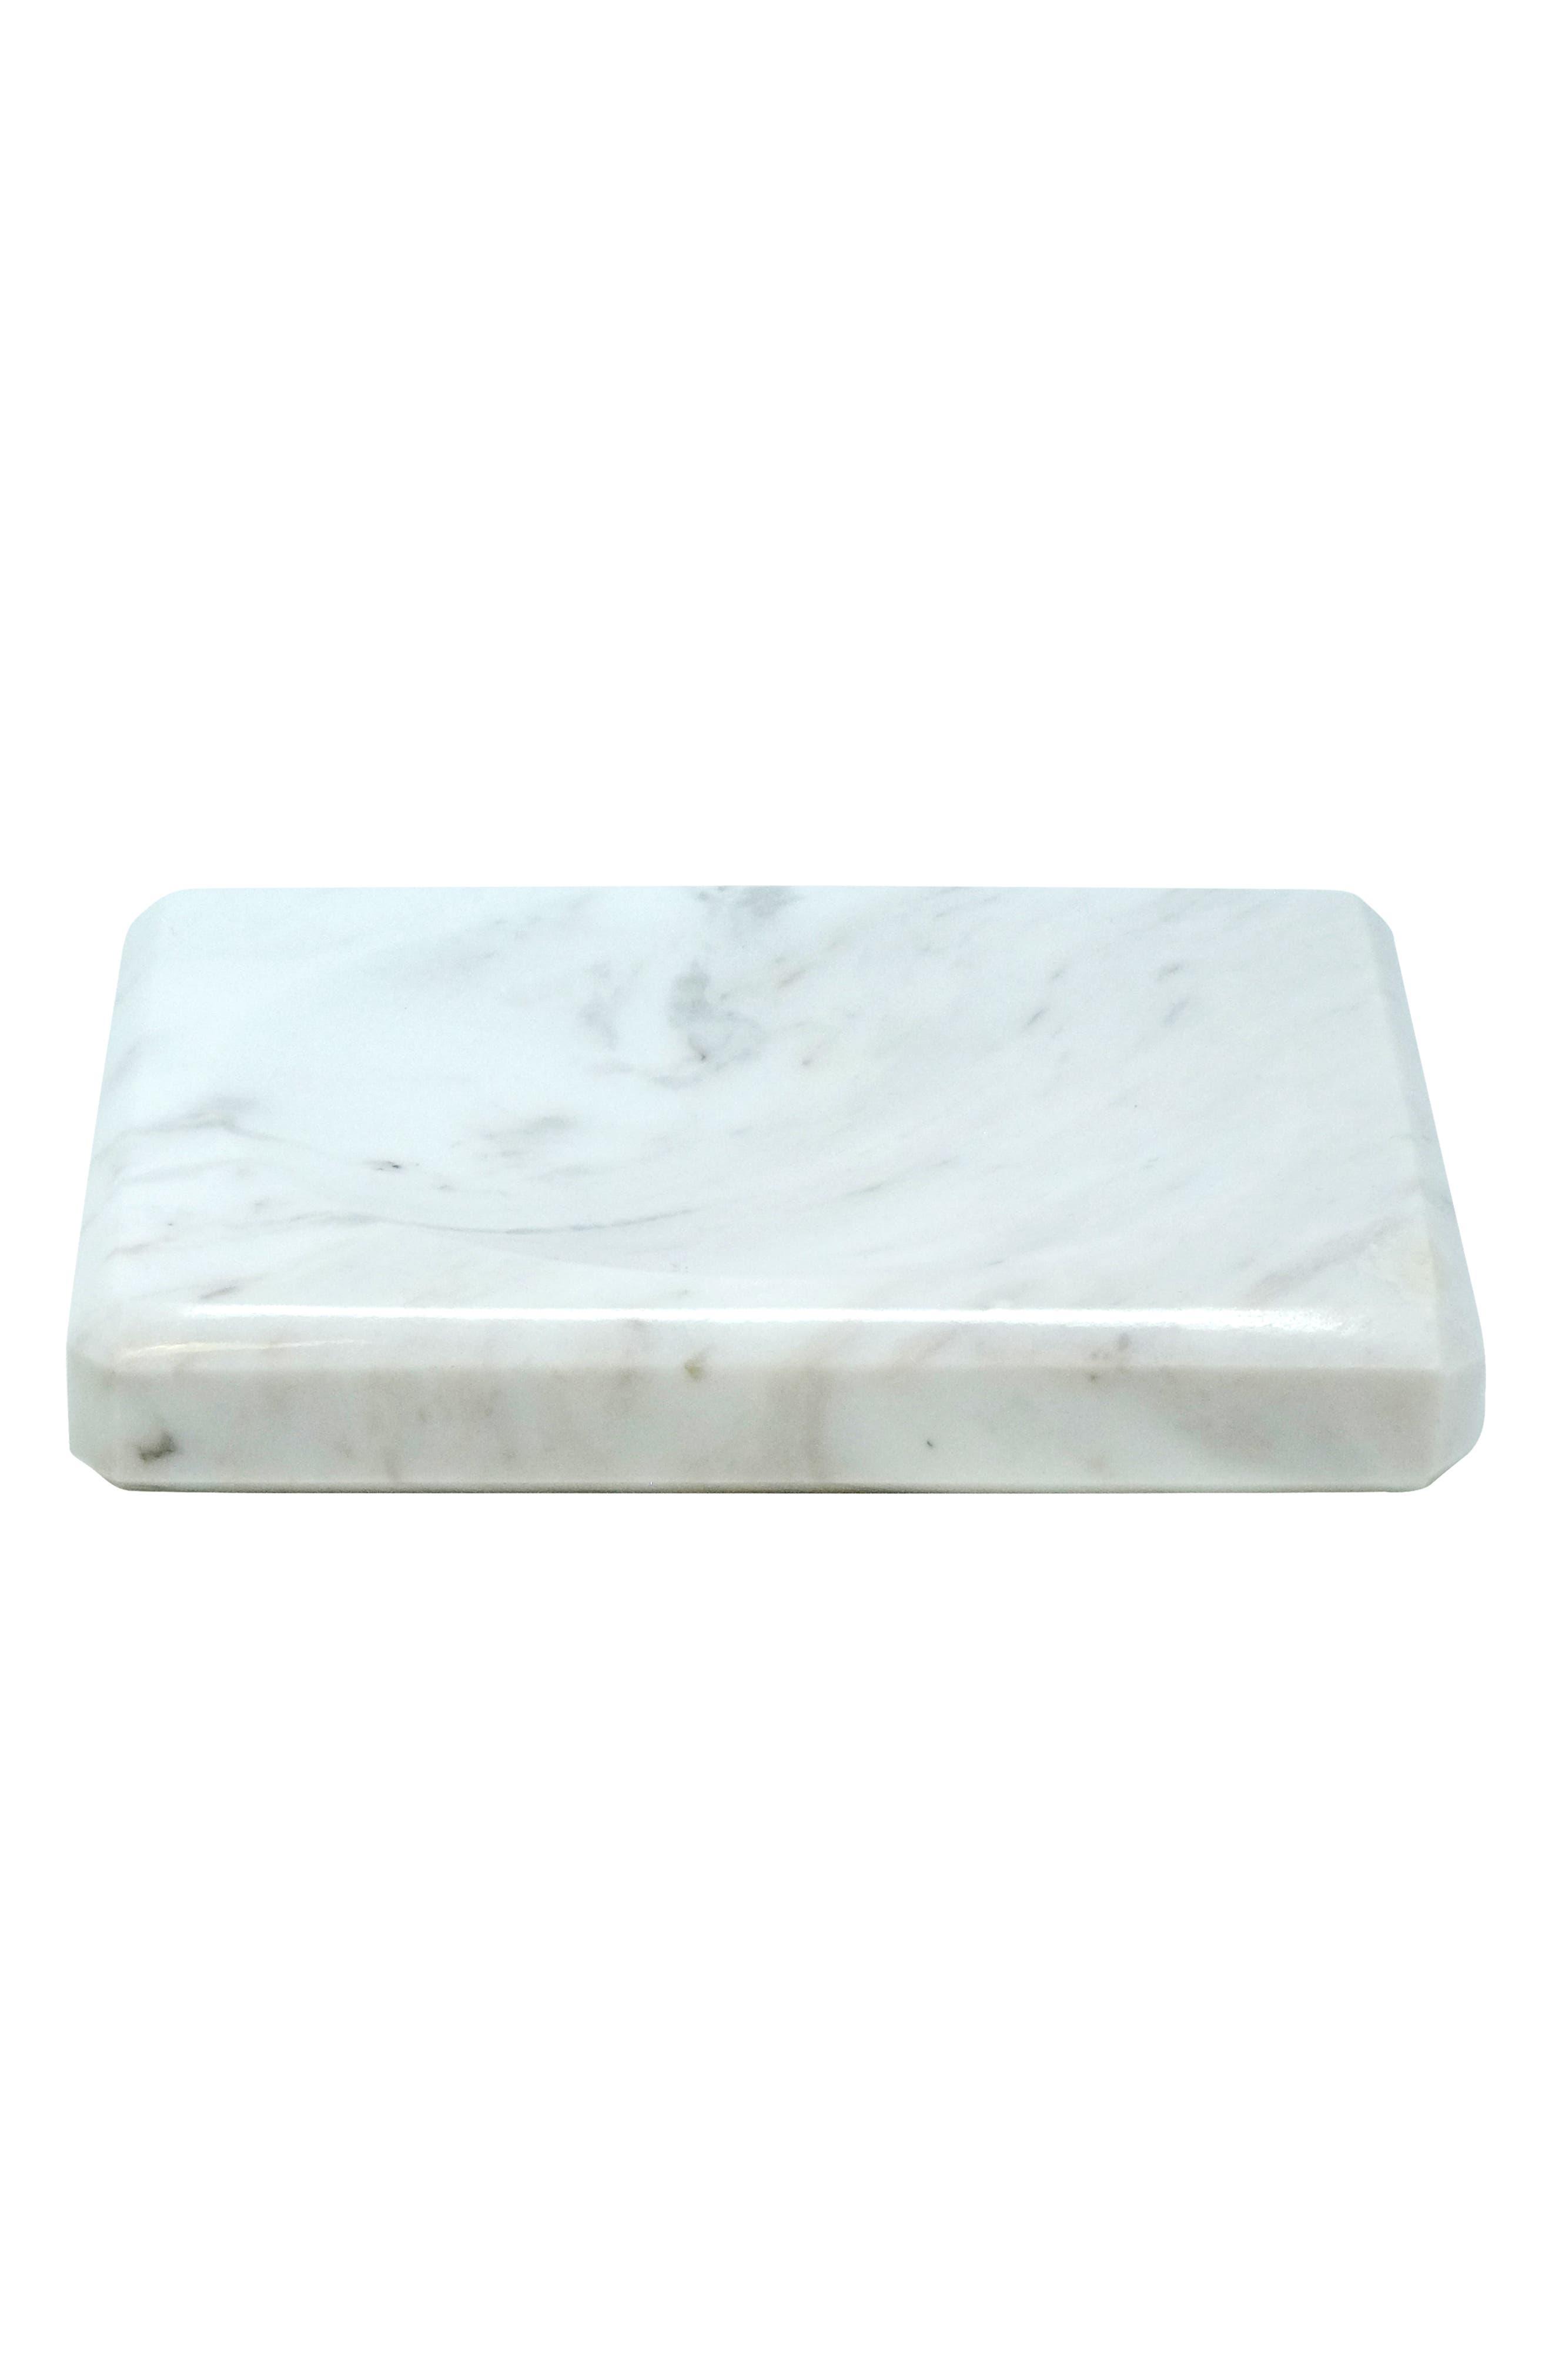 'Luna' White Marble Soap Dish,                             Main thumbnail 1, color,                             WHITE